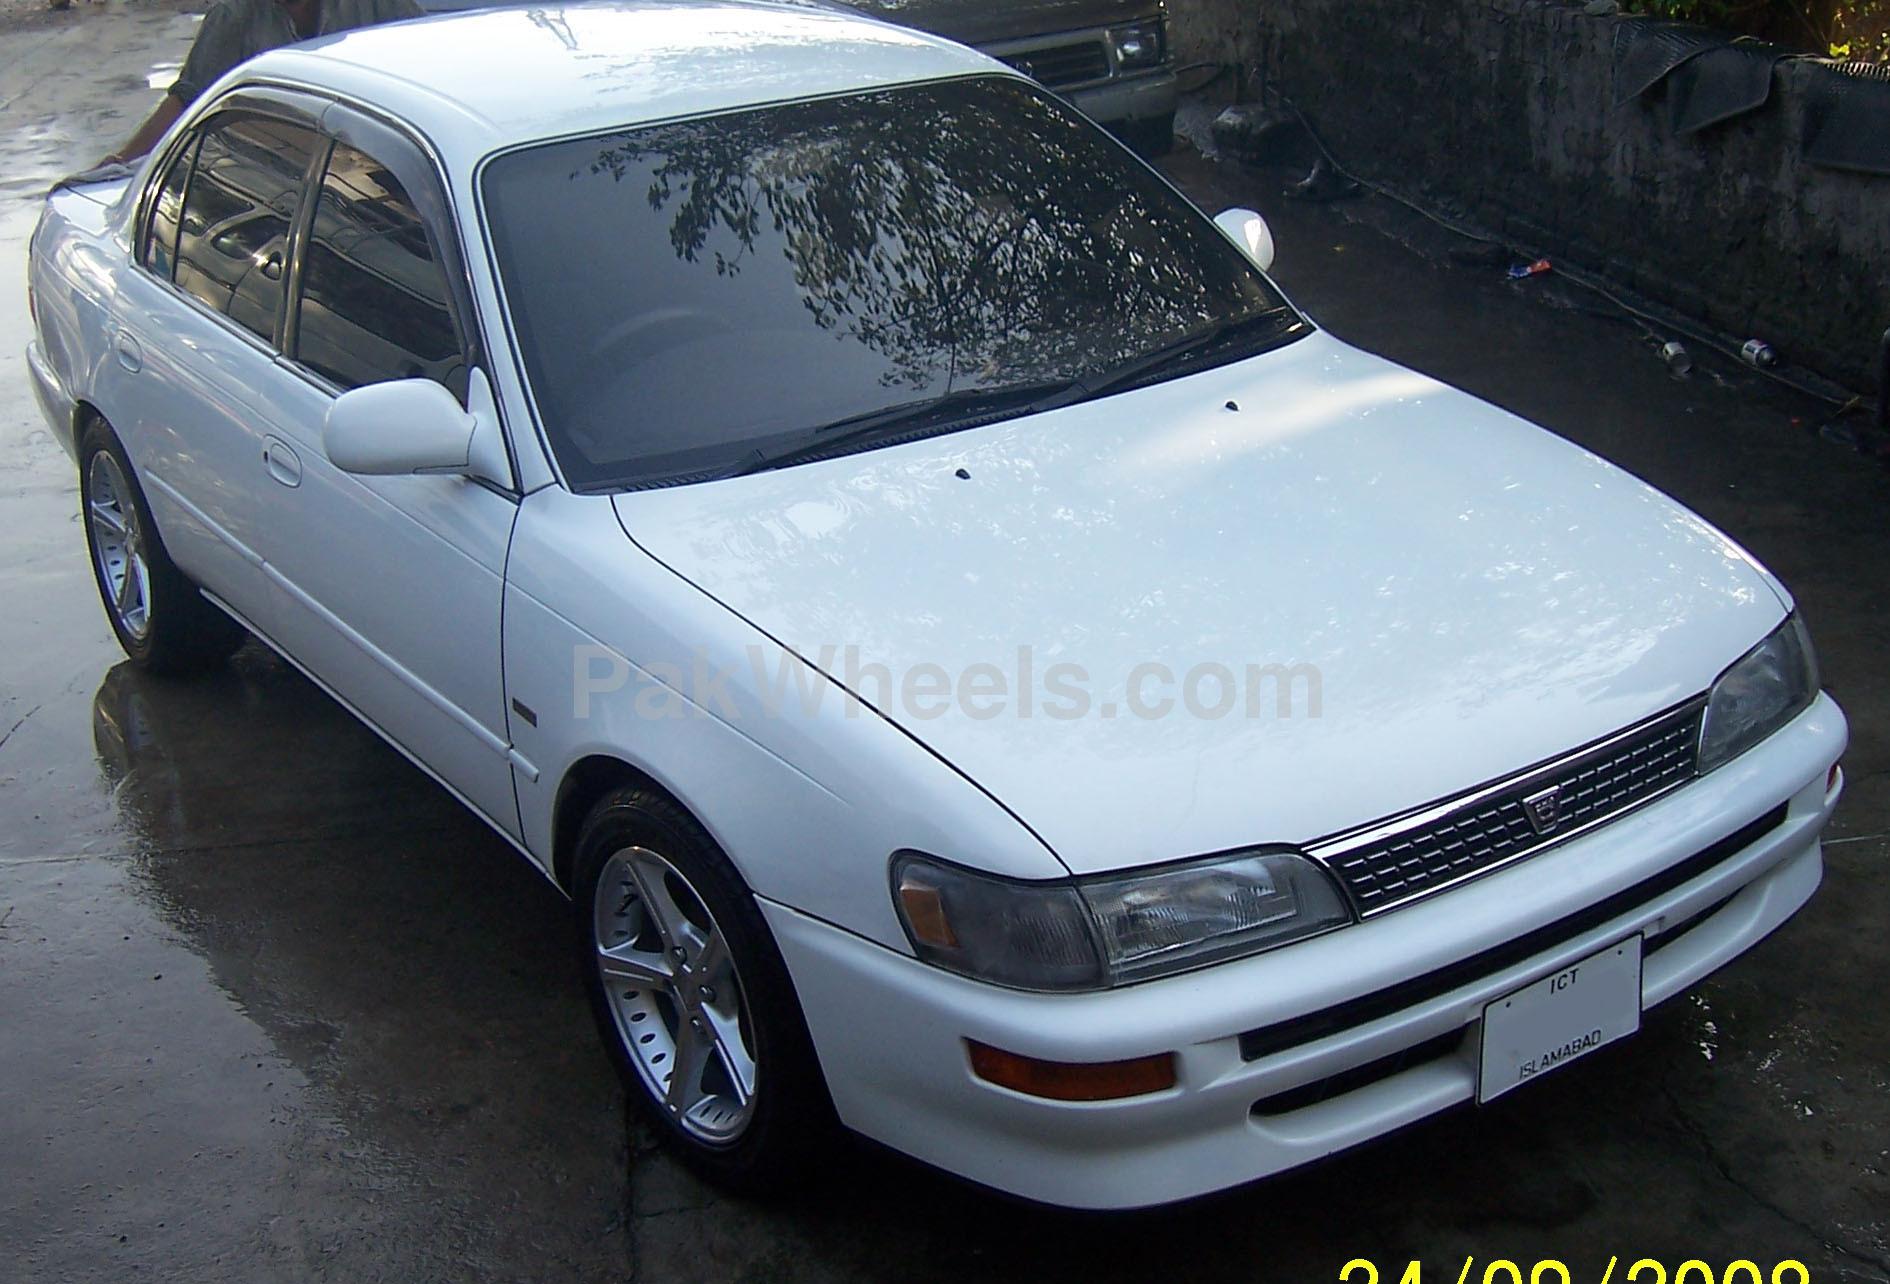 Japanese Import Car Insurance Online Quote >> Toyota Corolla 1995 of ysrcutoo - Member Ride 14235   PakWheels